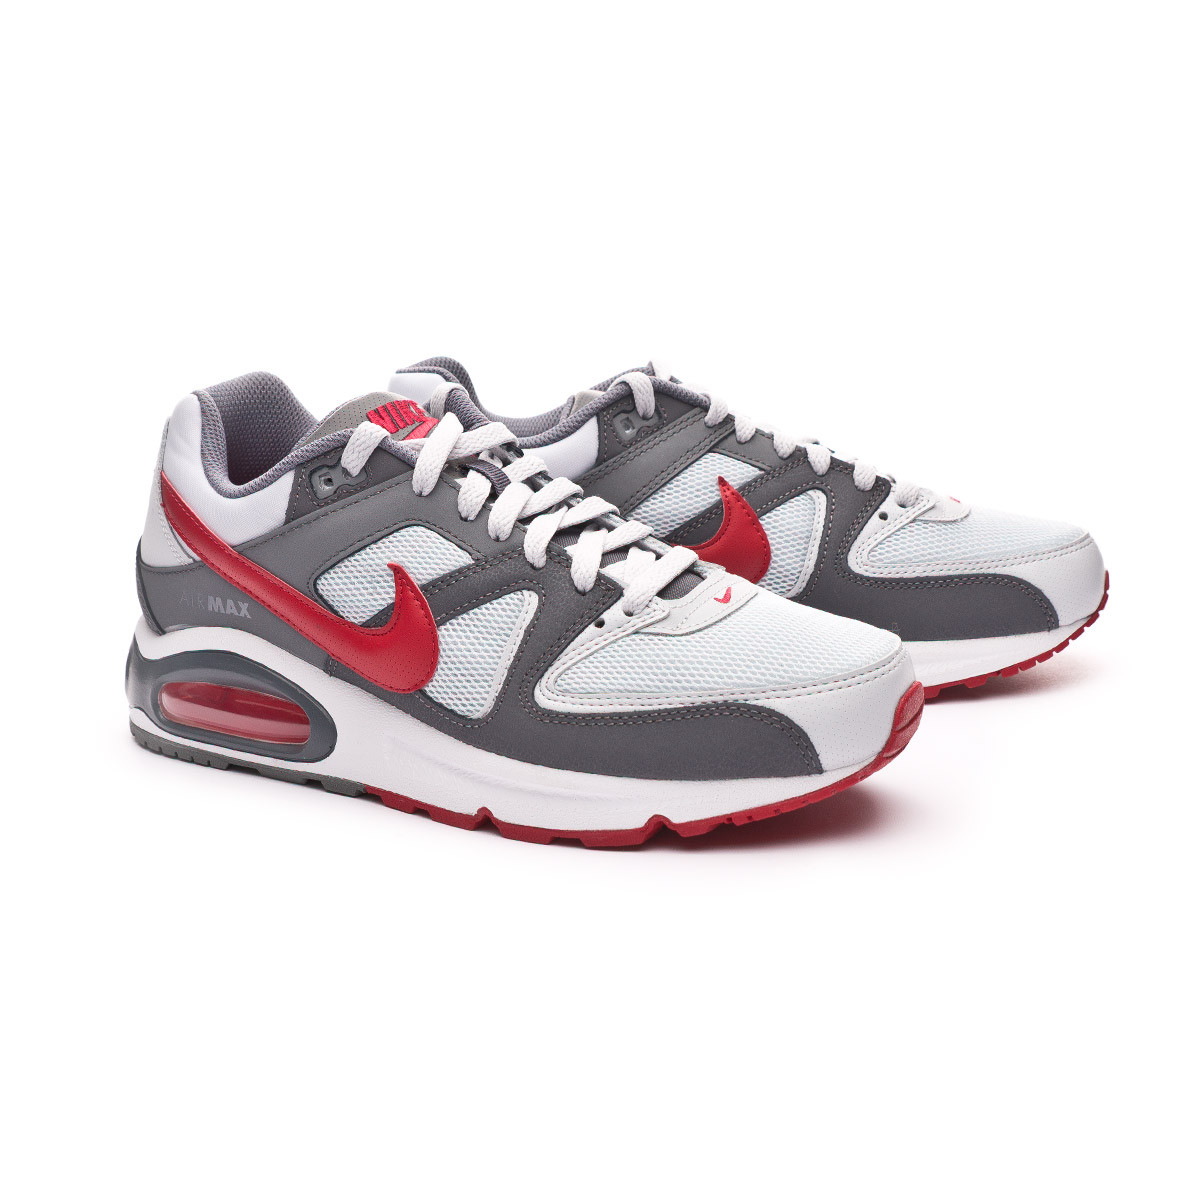 plus récent 0350d 13981 Zapatilla Air Max Command Shoe Pure platinum-Gym red-Dark grey